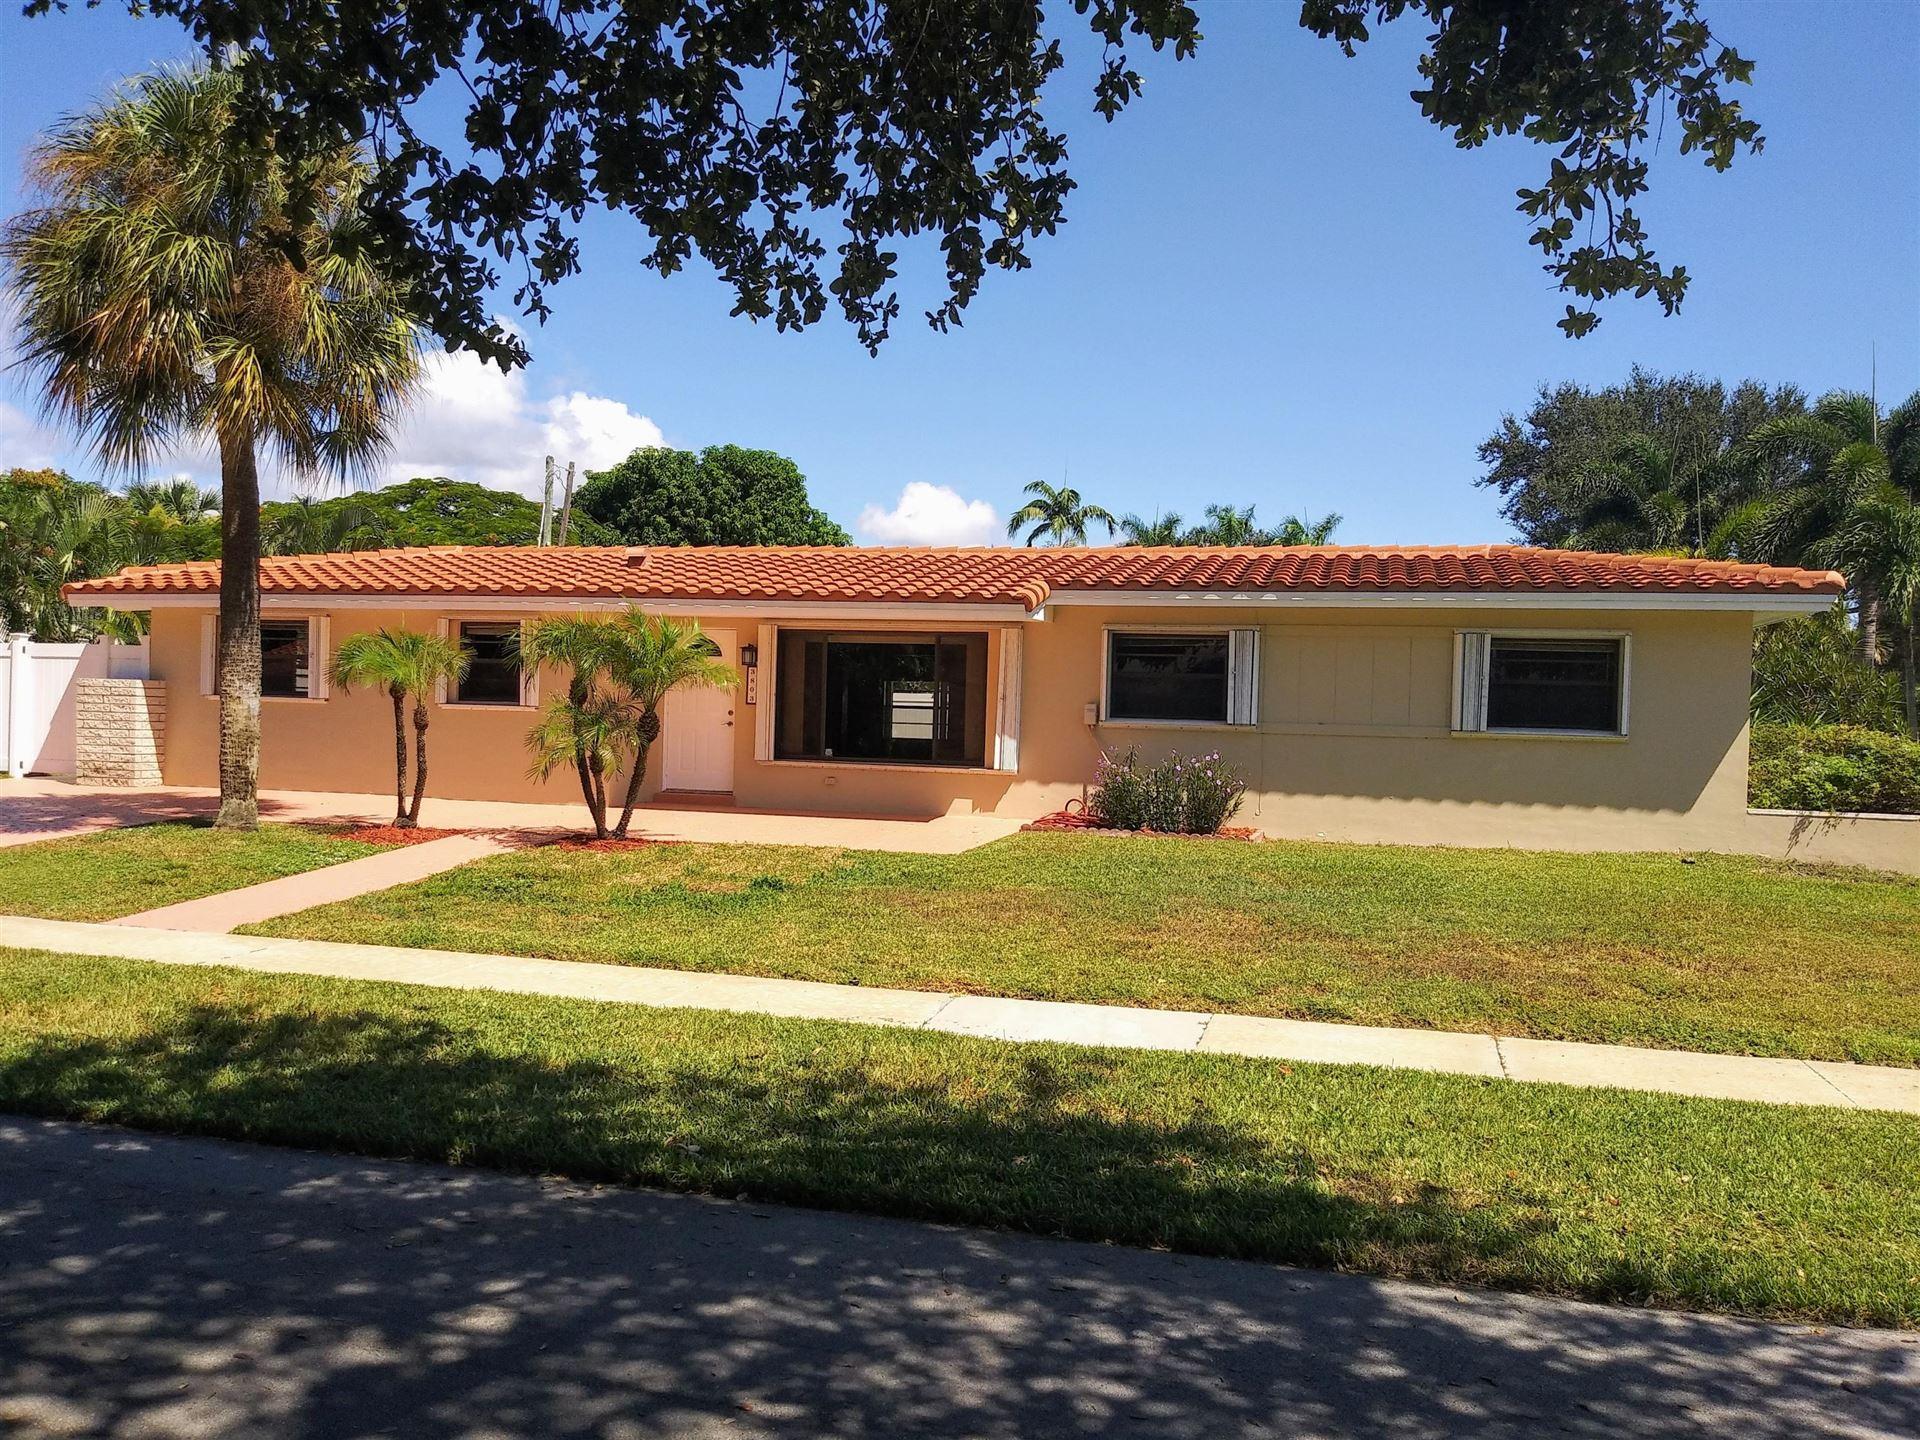 3803 NW 2nd Court, Boca Raton, FL 33431 - #: RX-10651951